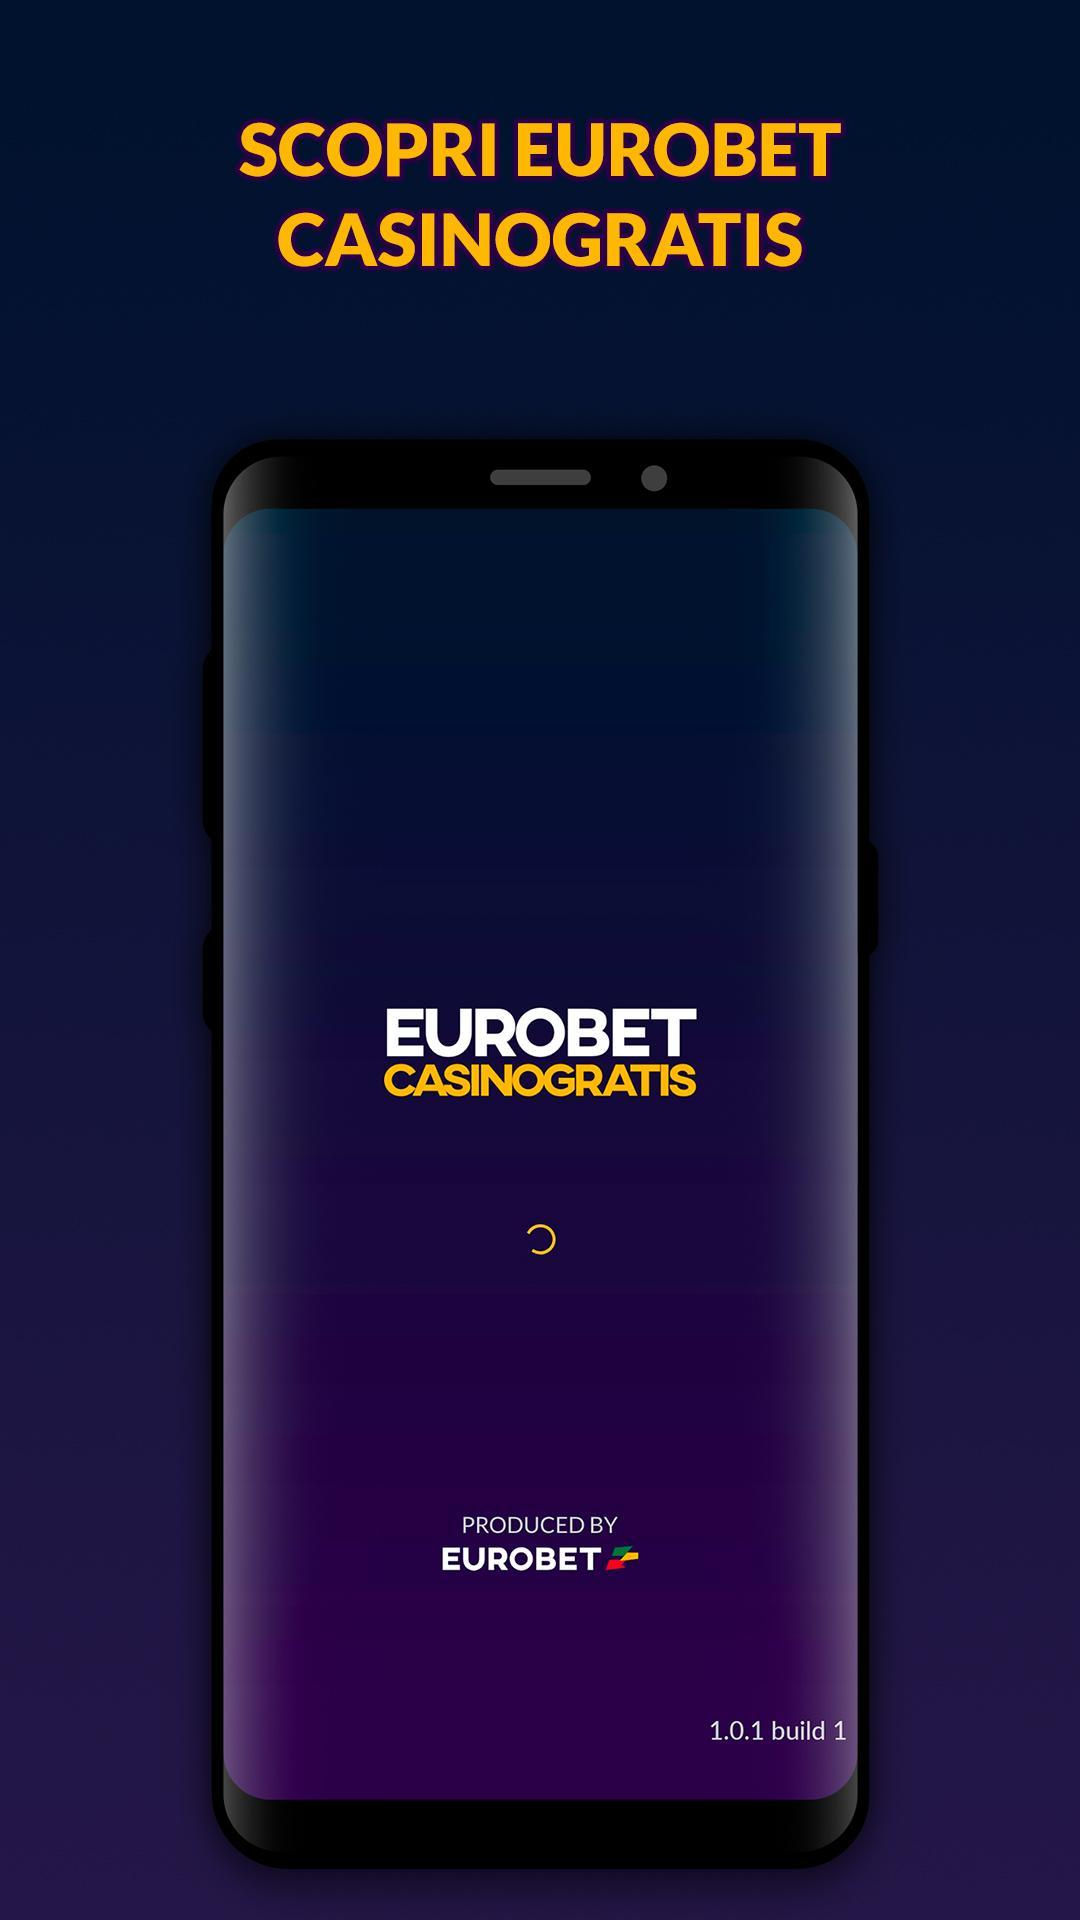 Eurobet Casino Gratis For Android Apk Download